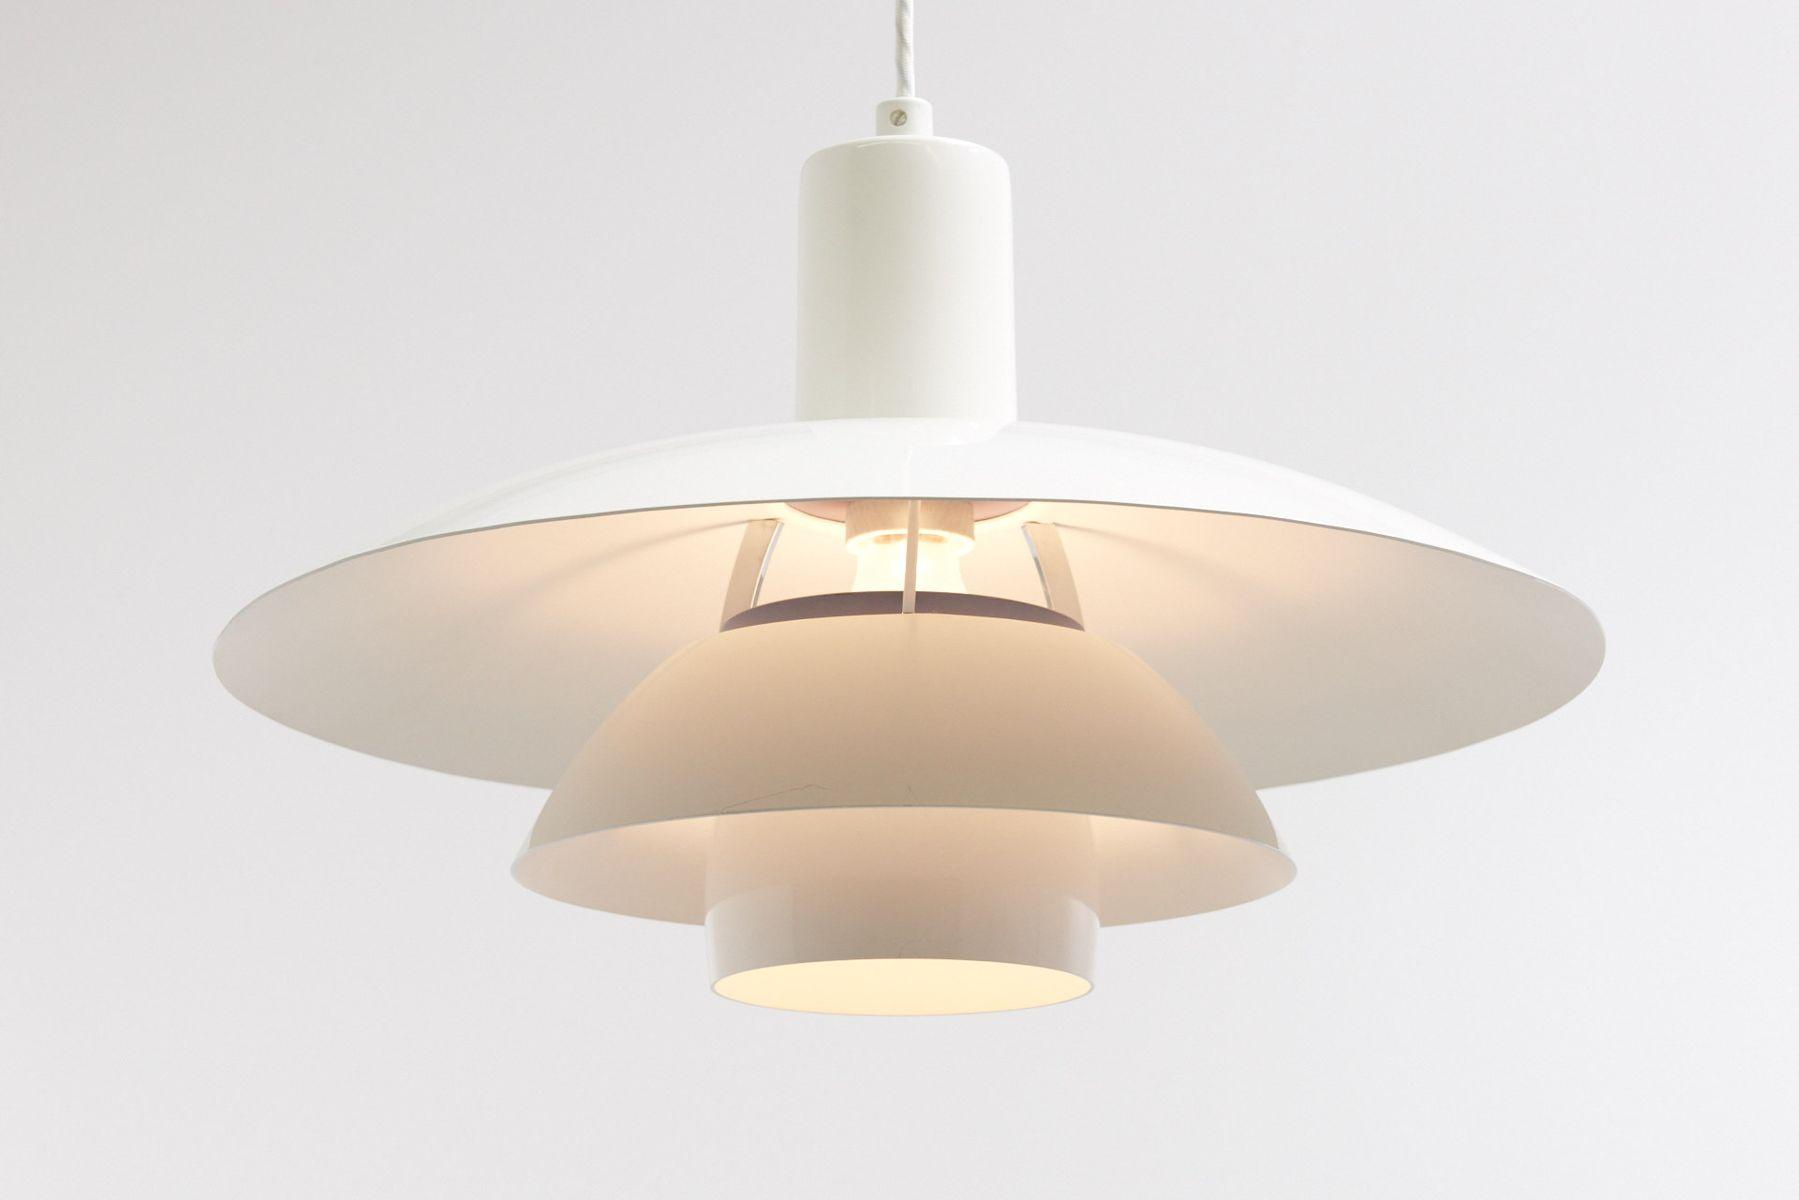 ph 4 4 1 2 lamps by poul henningsen for louis poulsen set. Black Bedroom Furniture Sets. Home Design Ideas